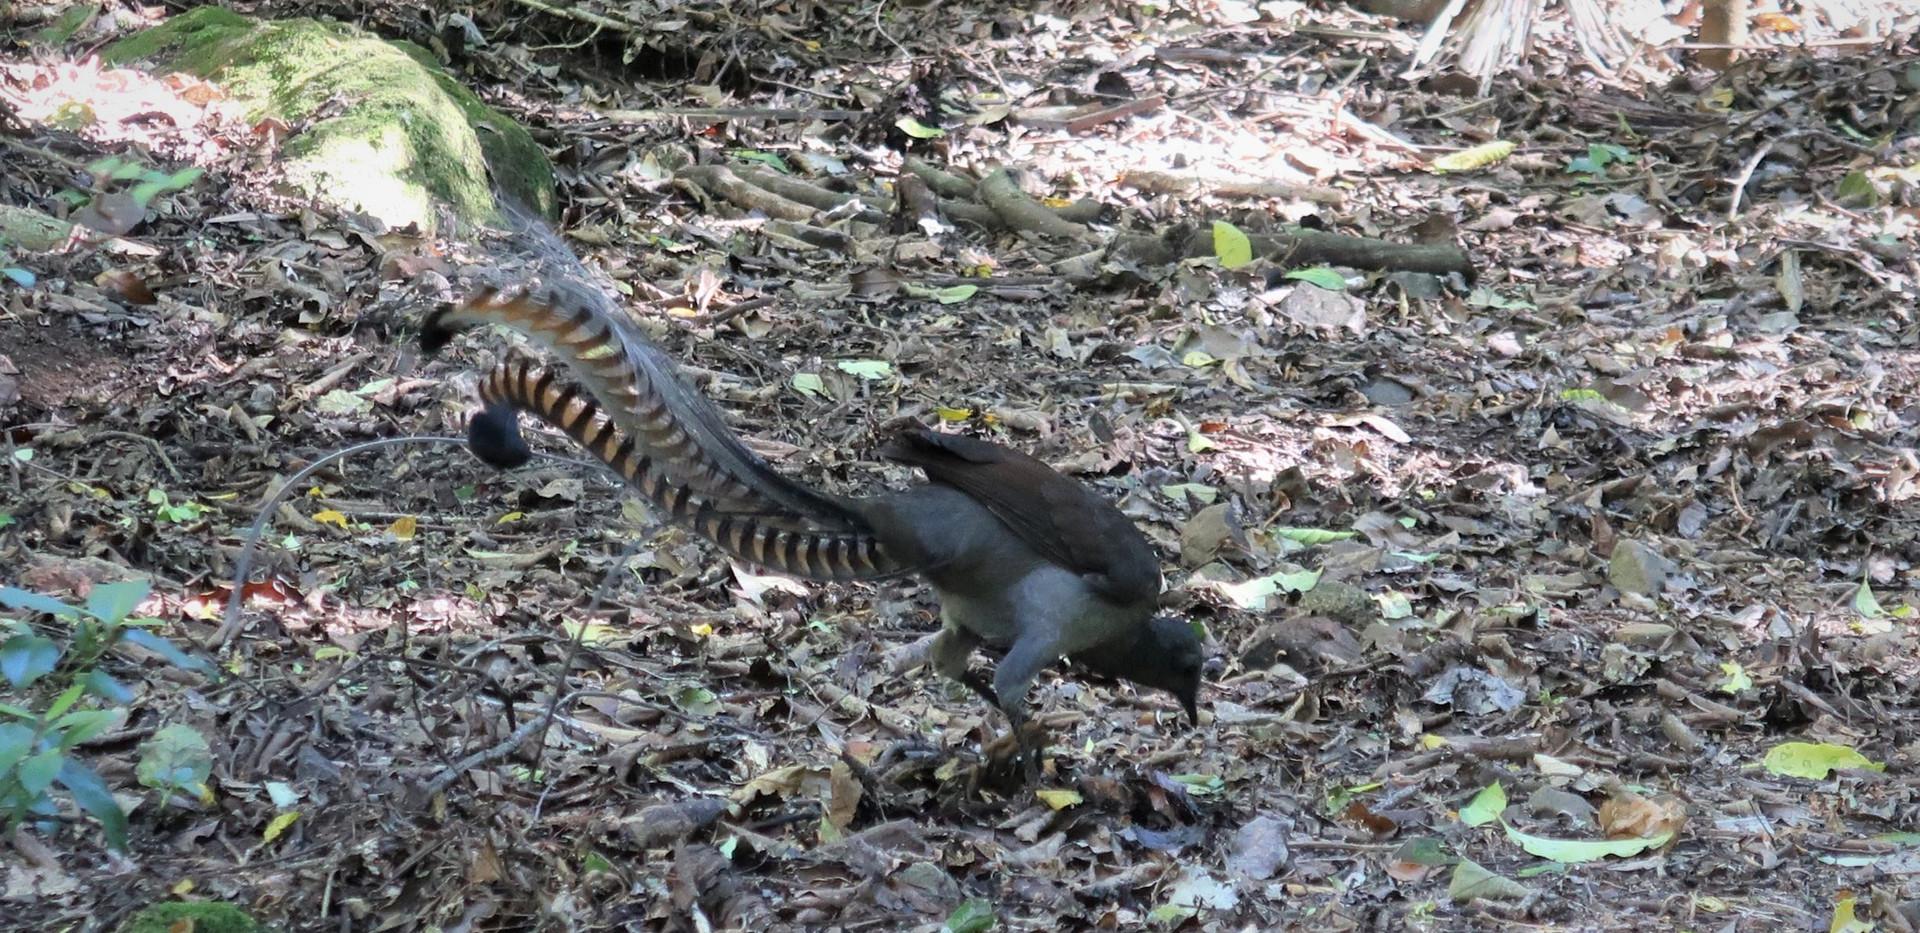 Lyre Bird in National park Sydney